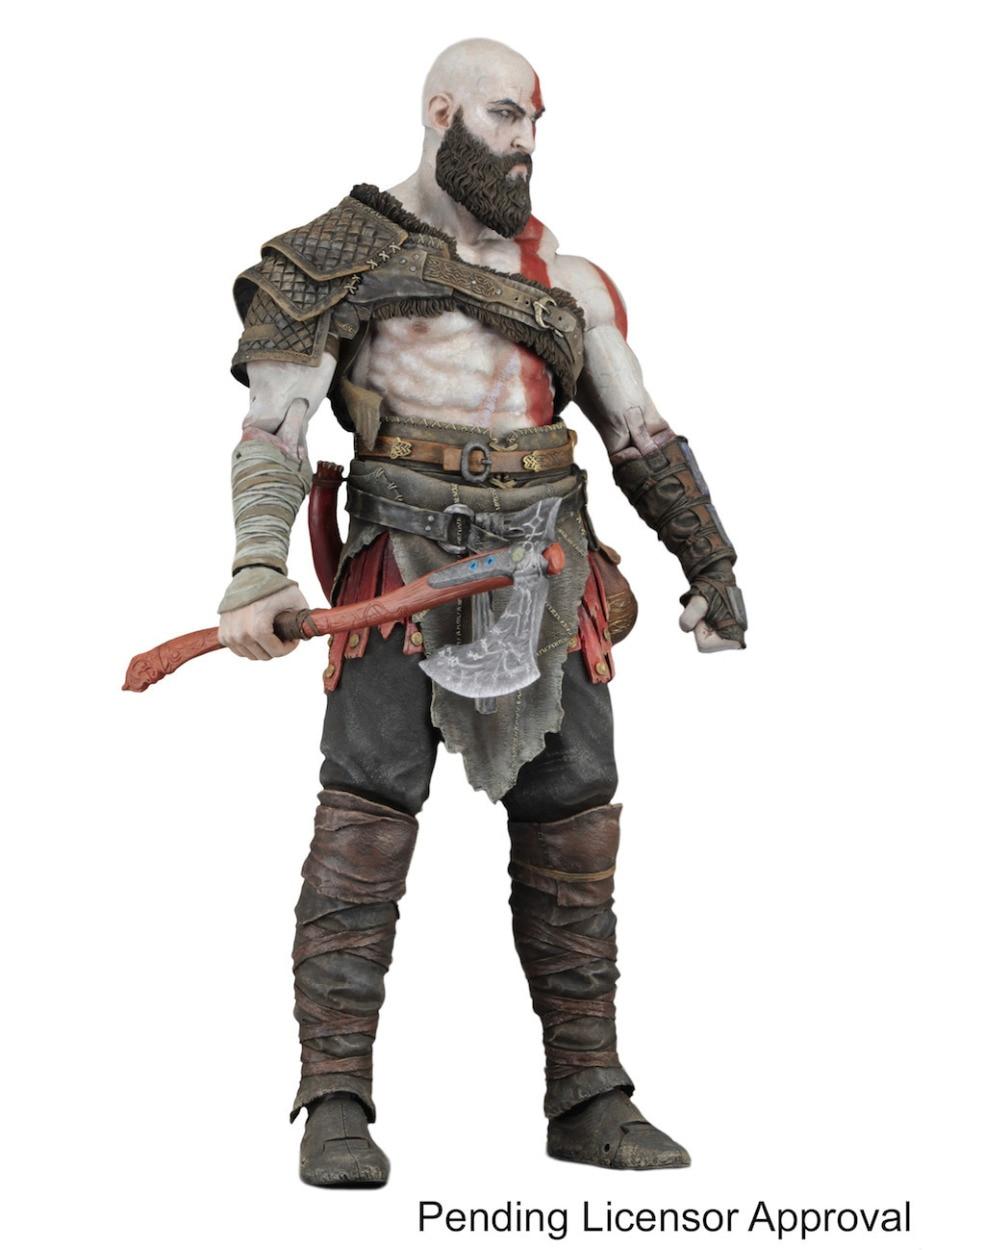 Tobyfancy NECA Game God Of War Kratos կացինով PVC - Խաղային արձանիկներ - Լուսանկար 2